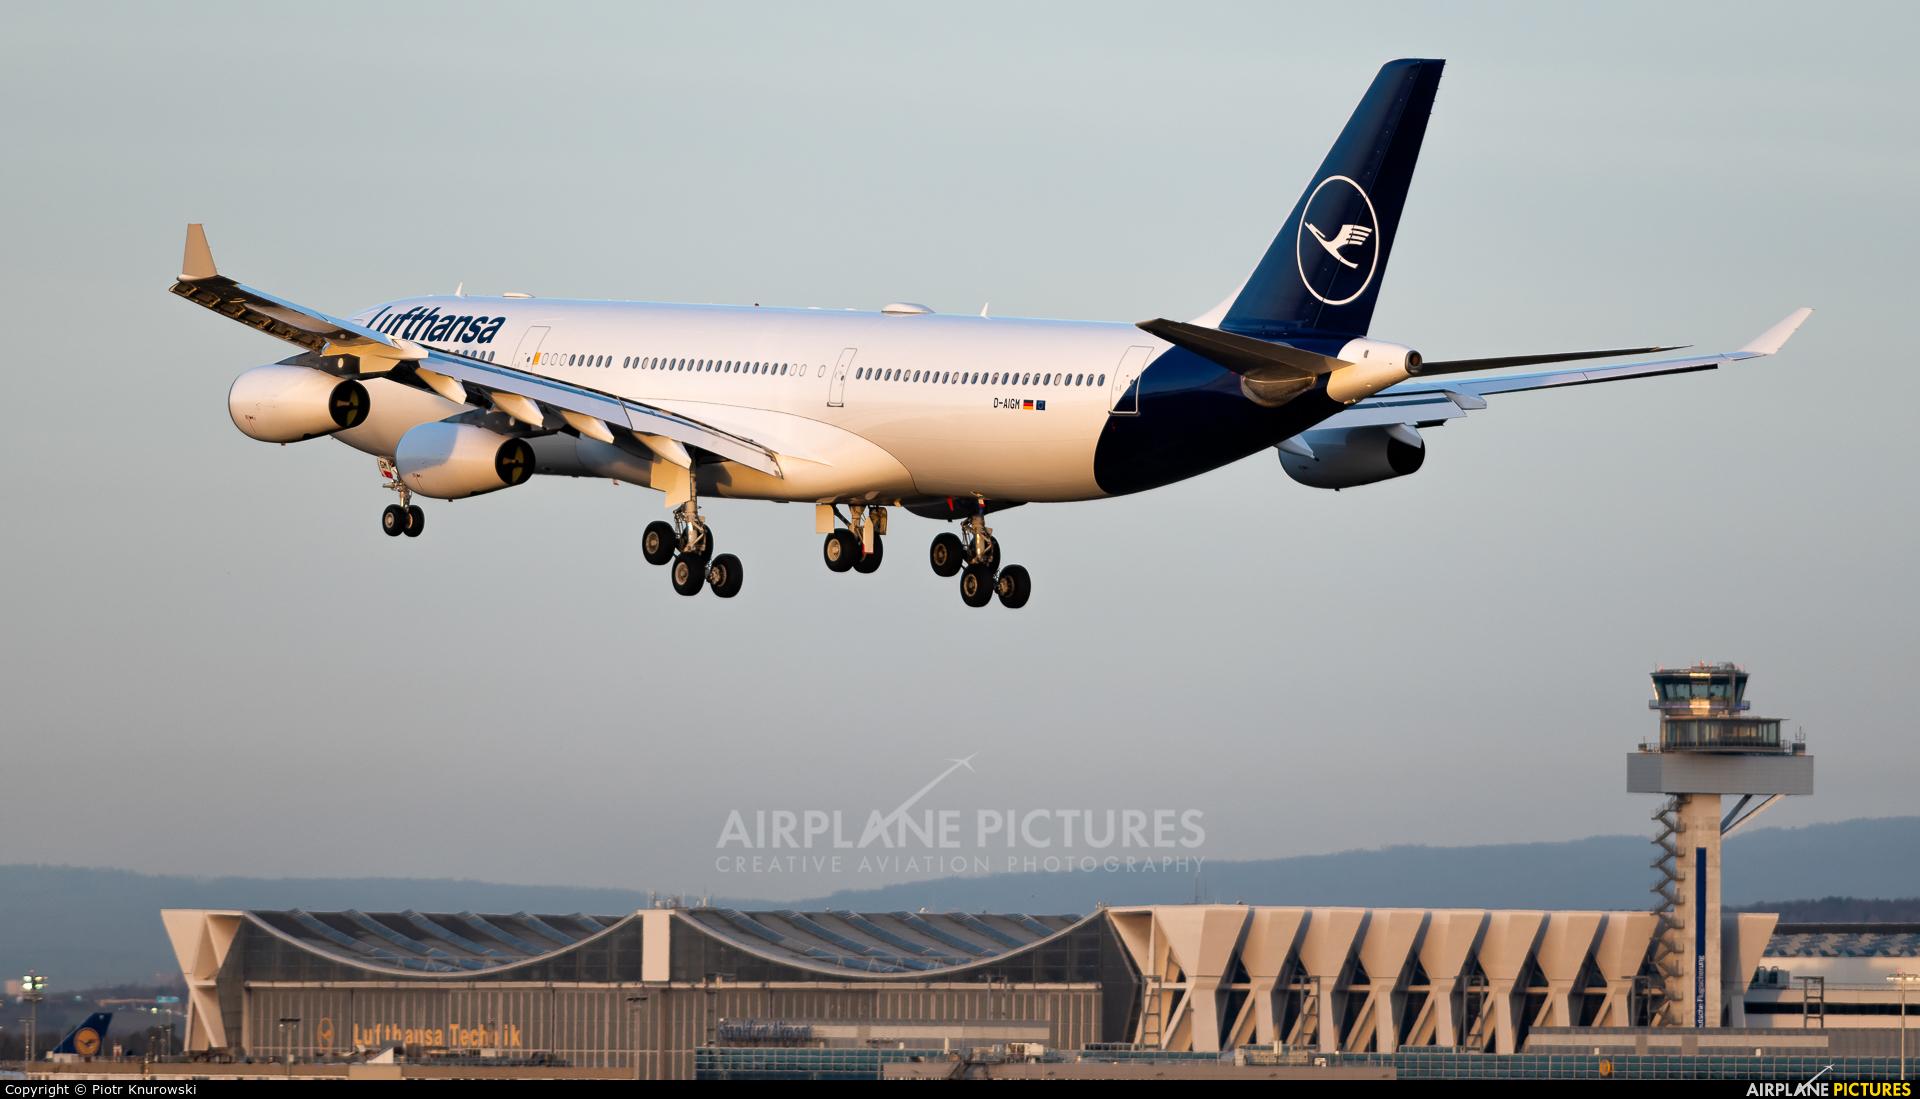 Lufthansa D-AIGM aircraft at Frankfurt